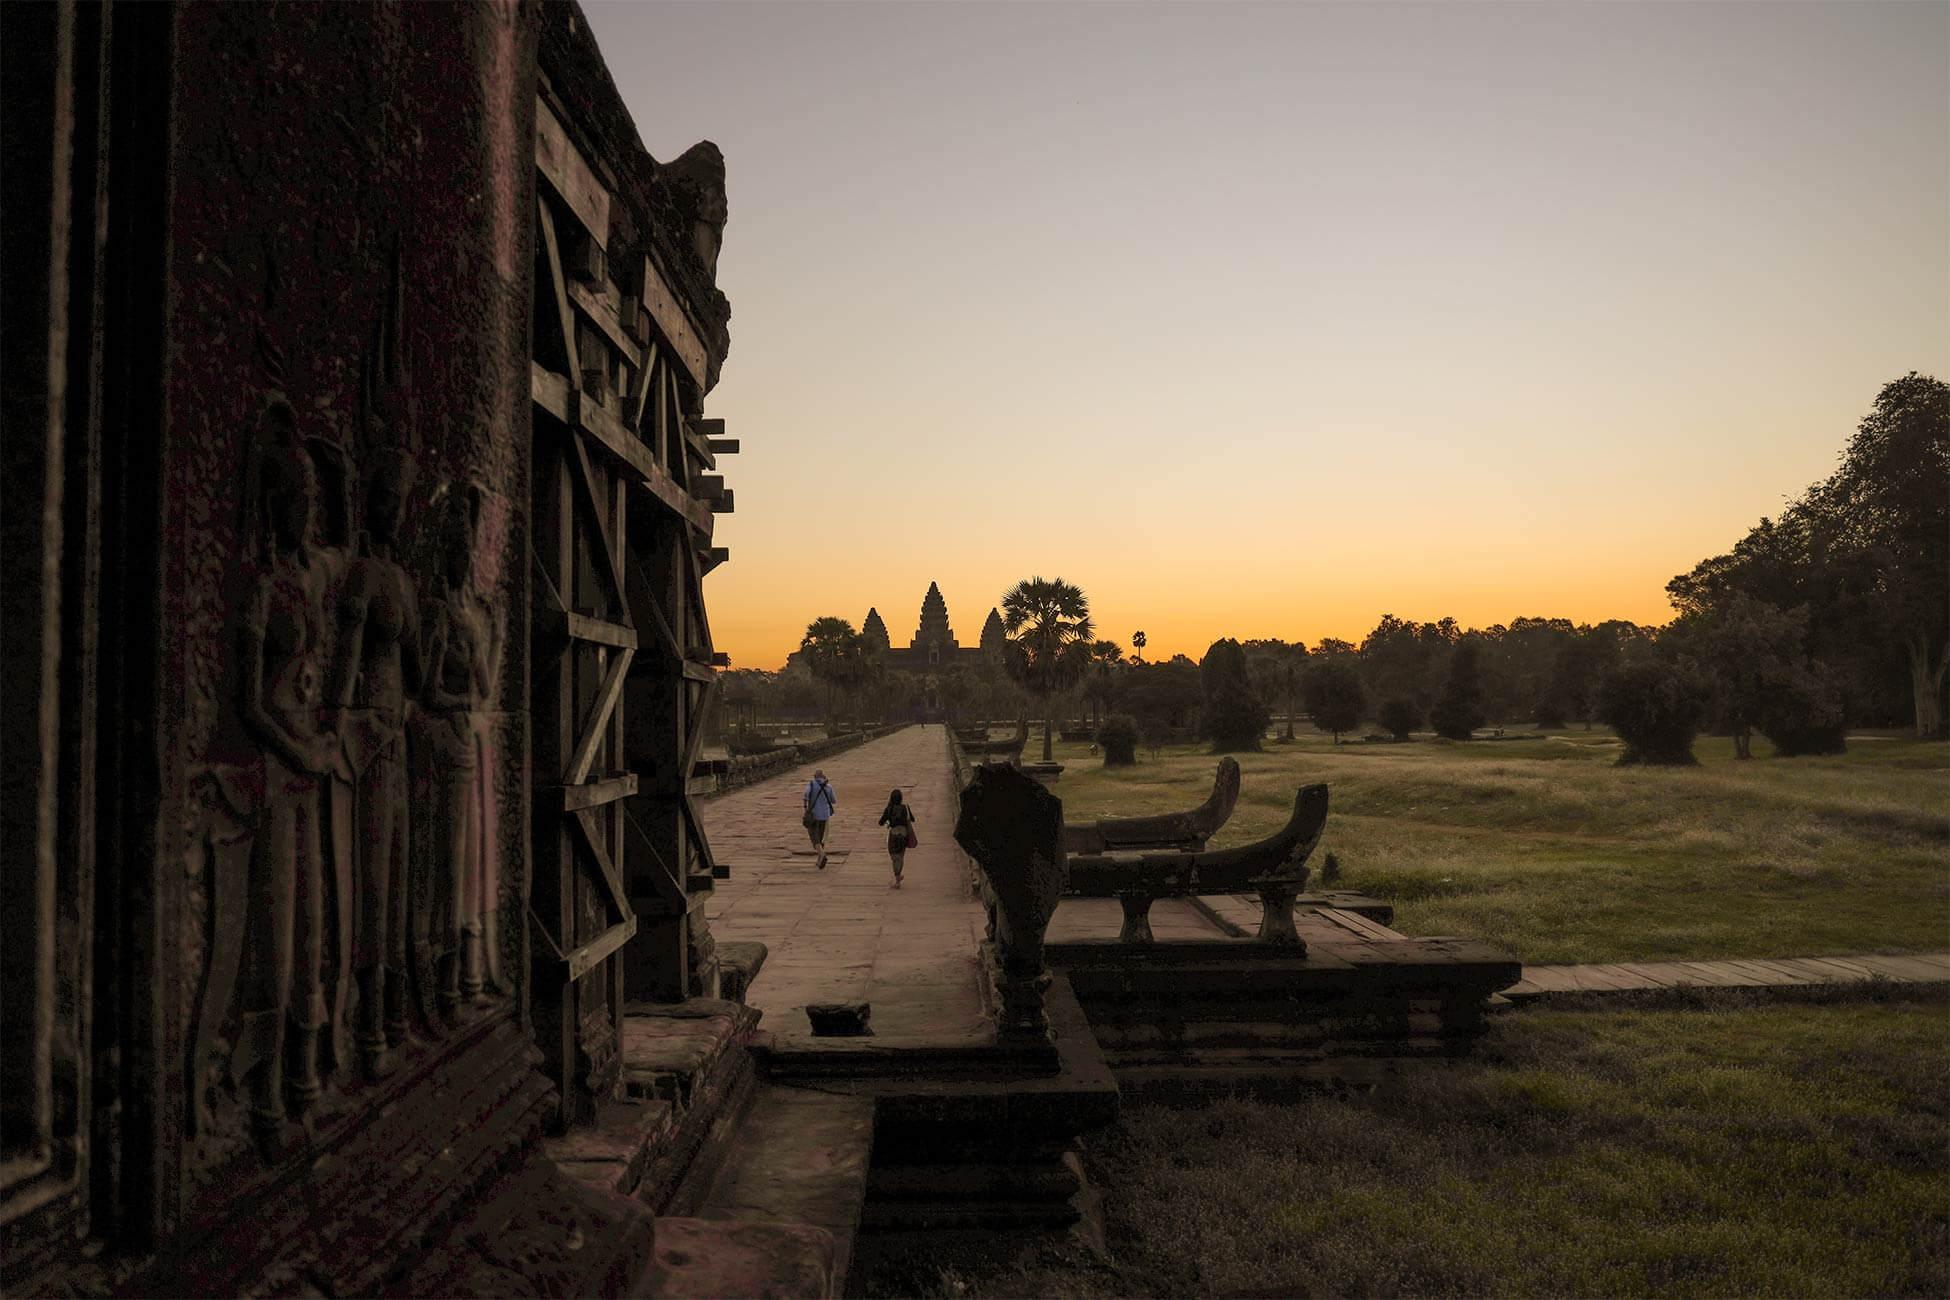 Kambodscha in Zeiten von Corona